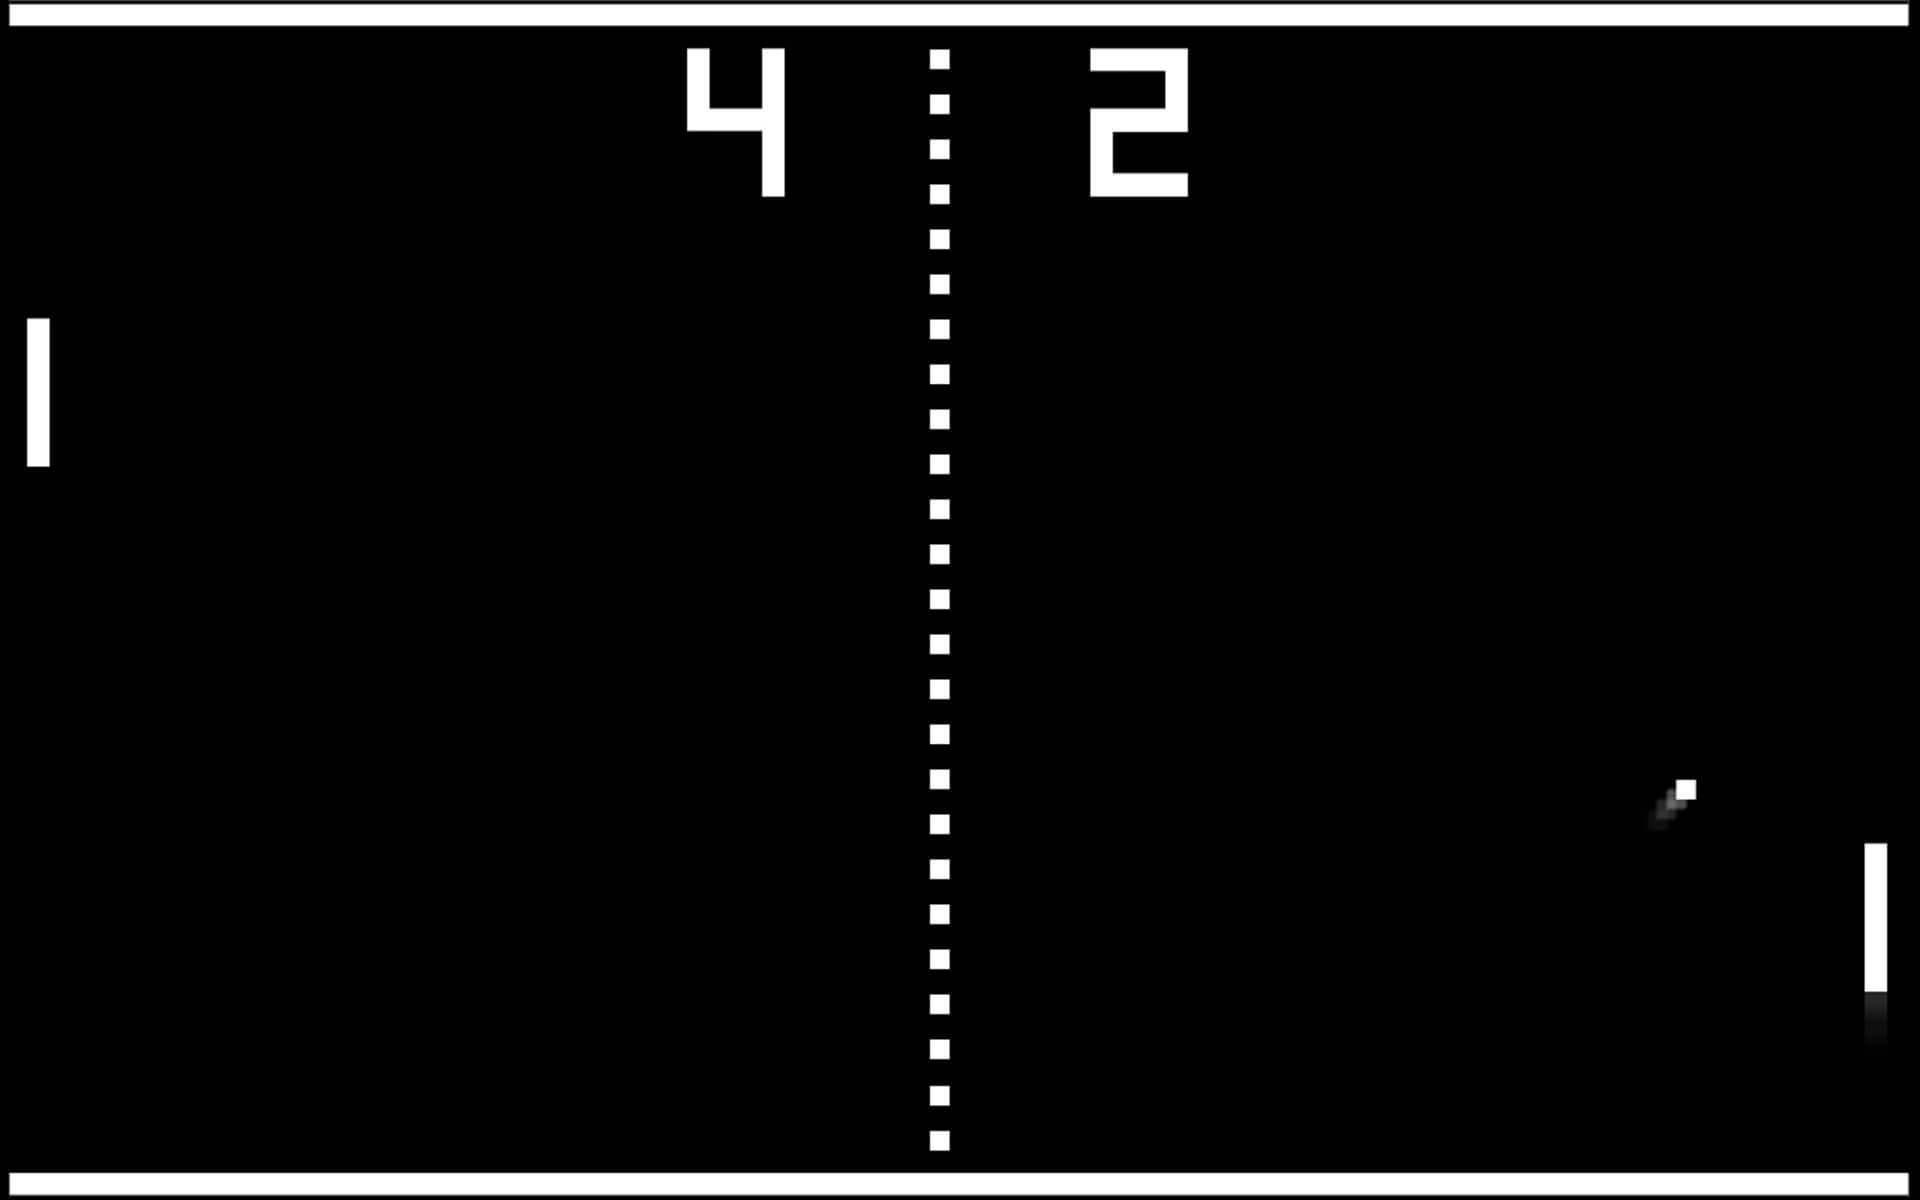 Screenshot from Pong, a tennis game